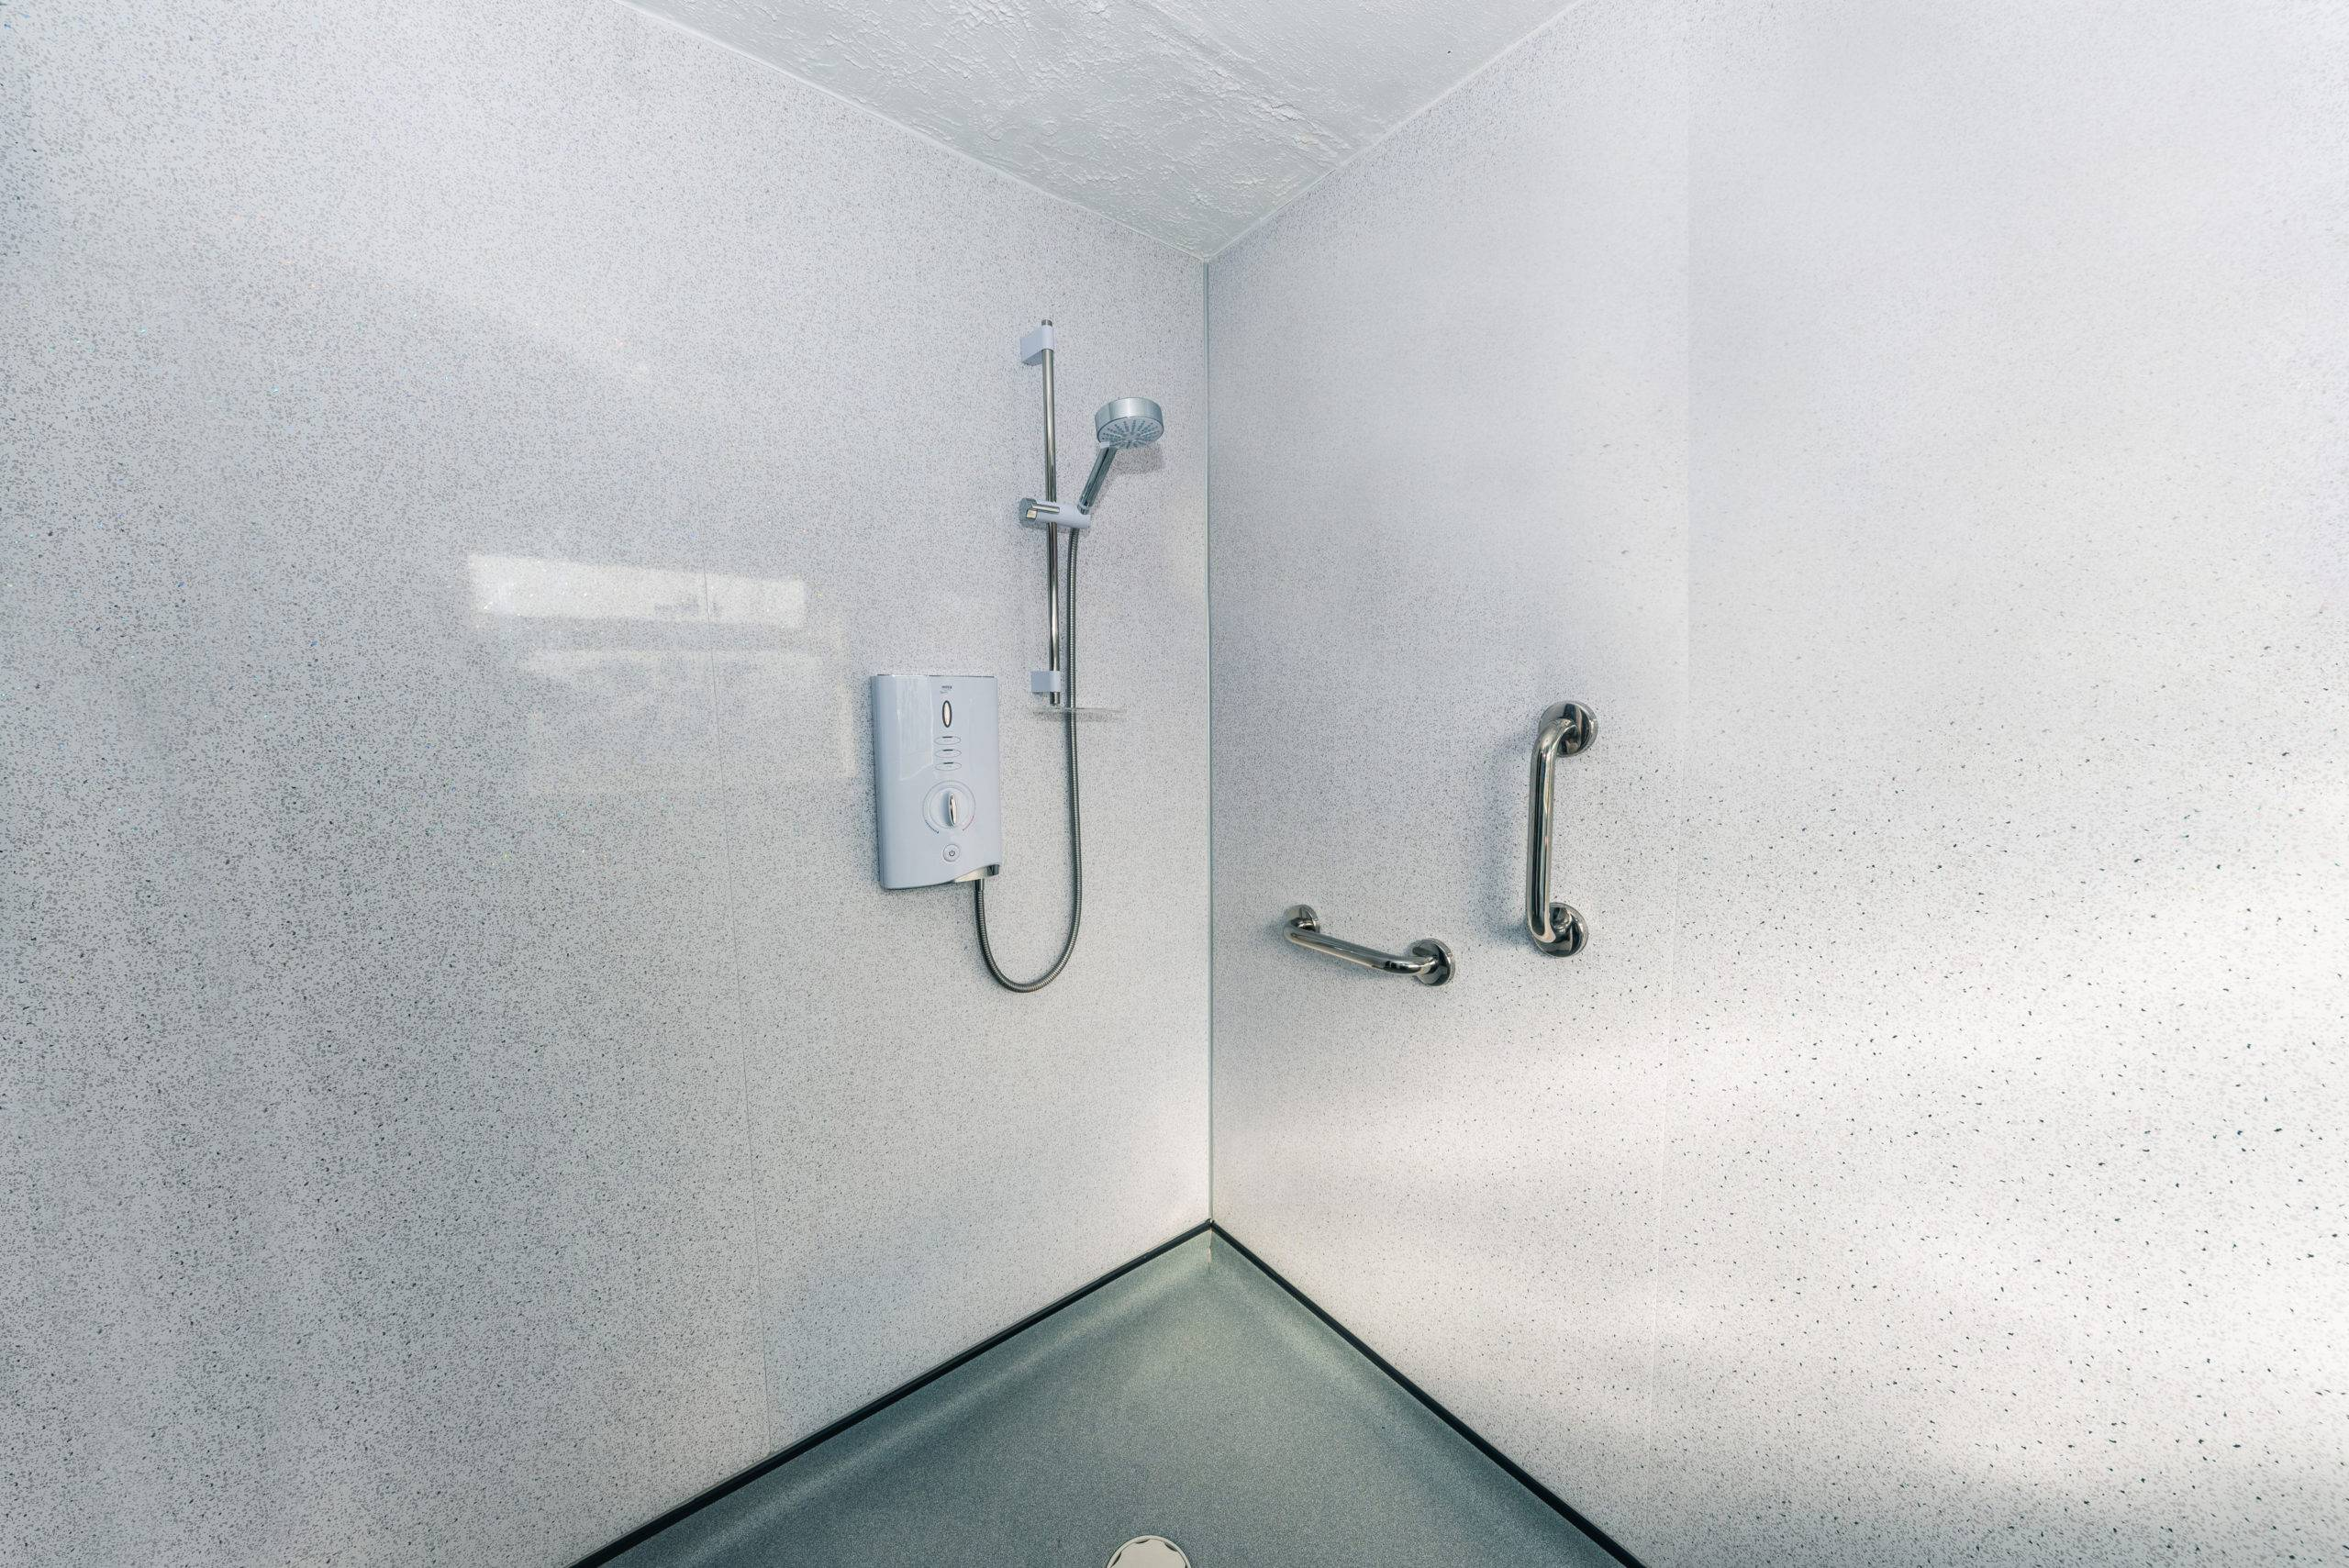 Wet room-shower handles - white wall